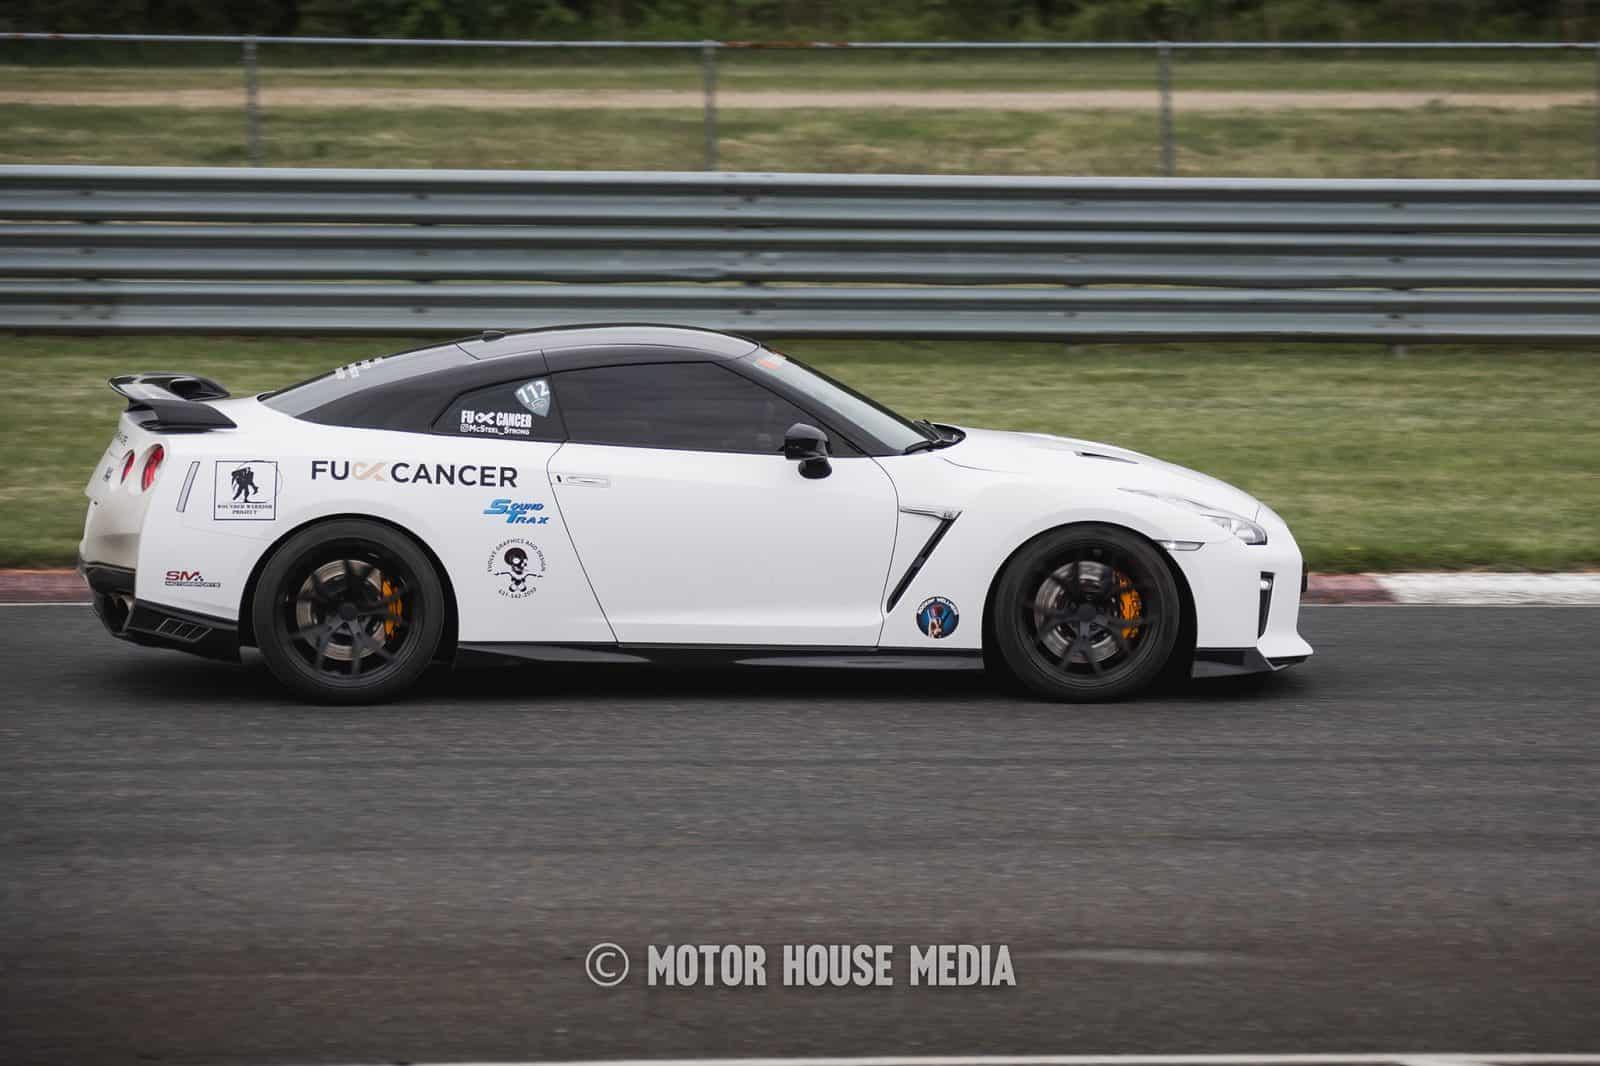 GTR roll racing